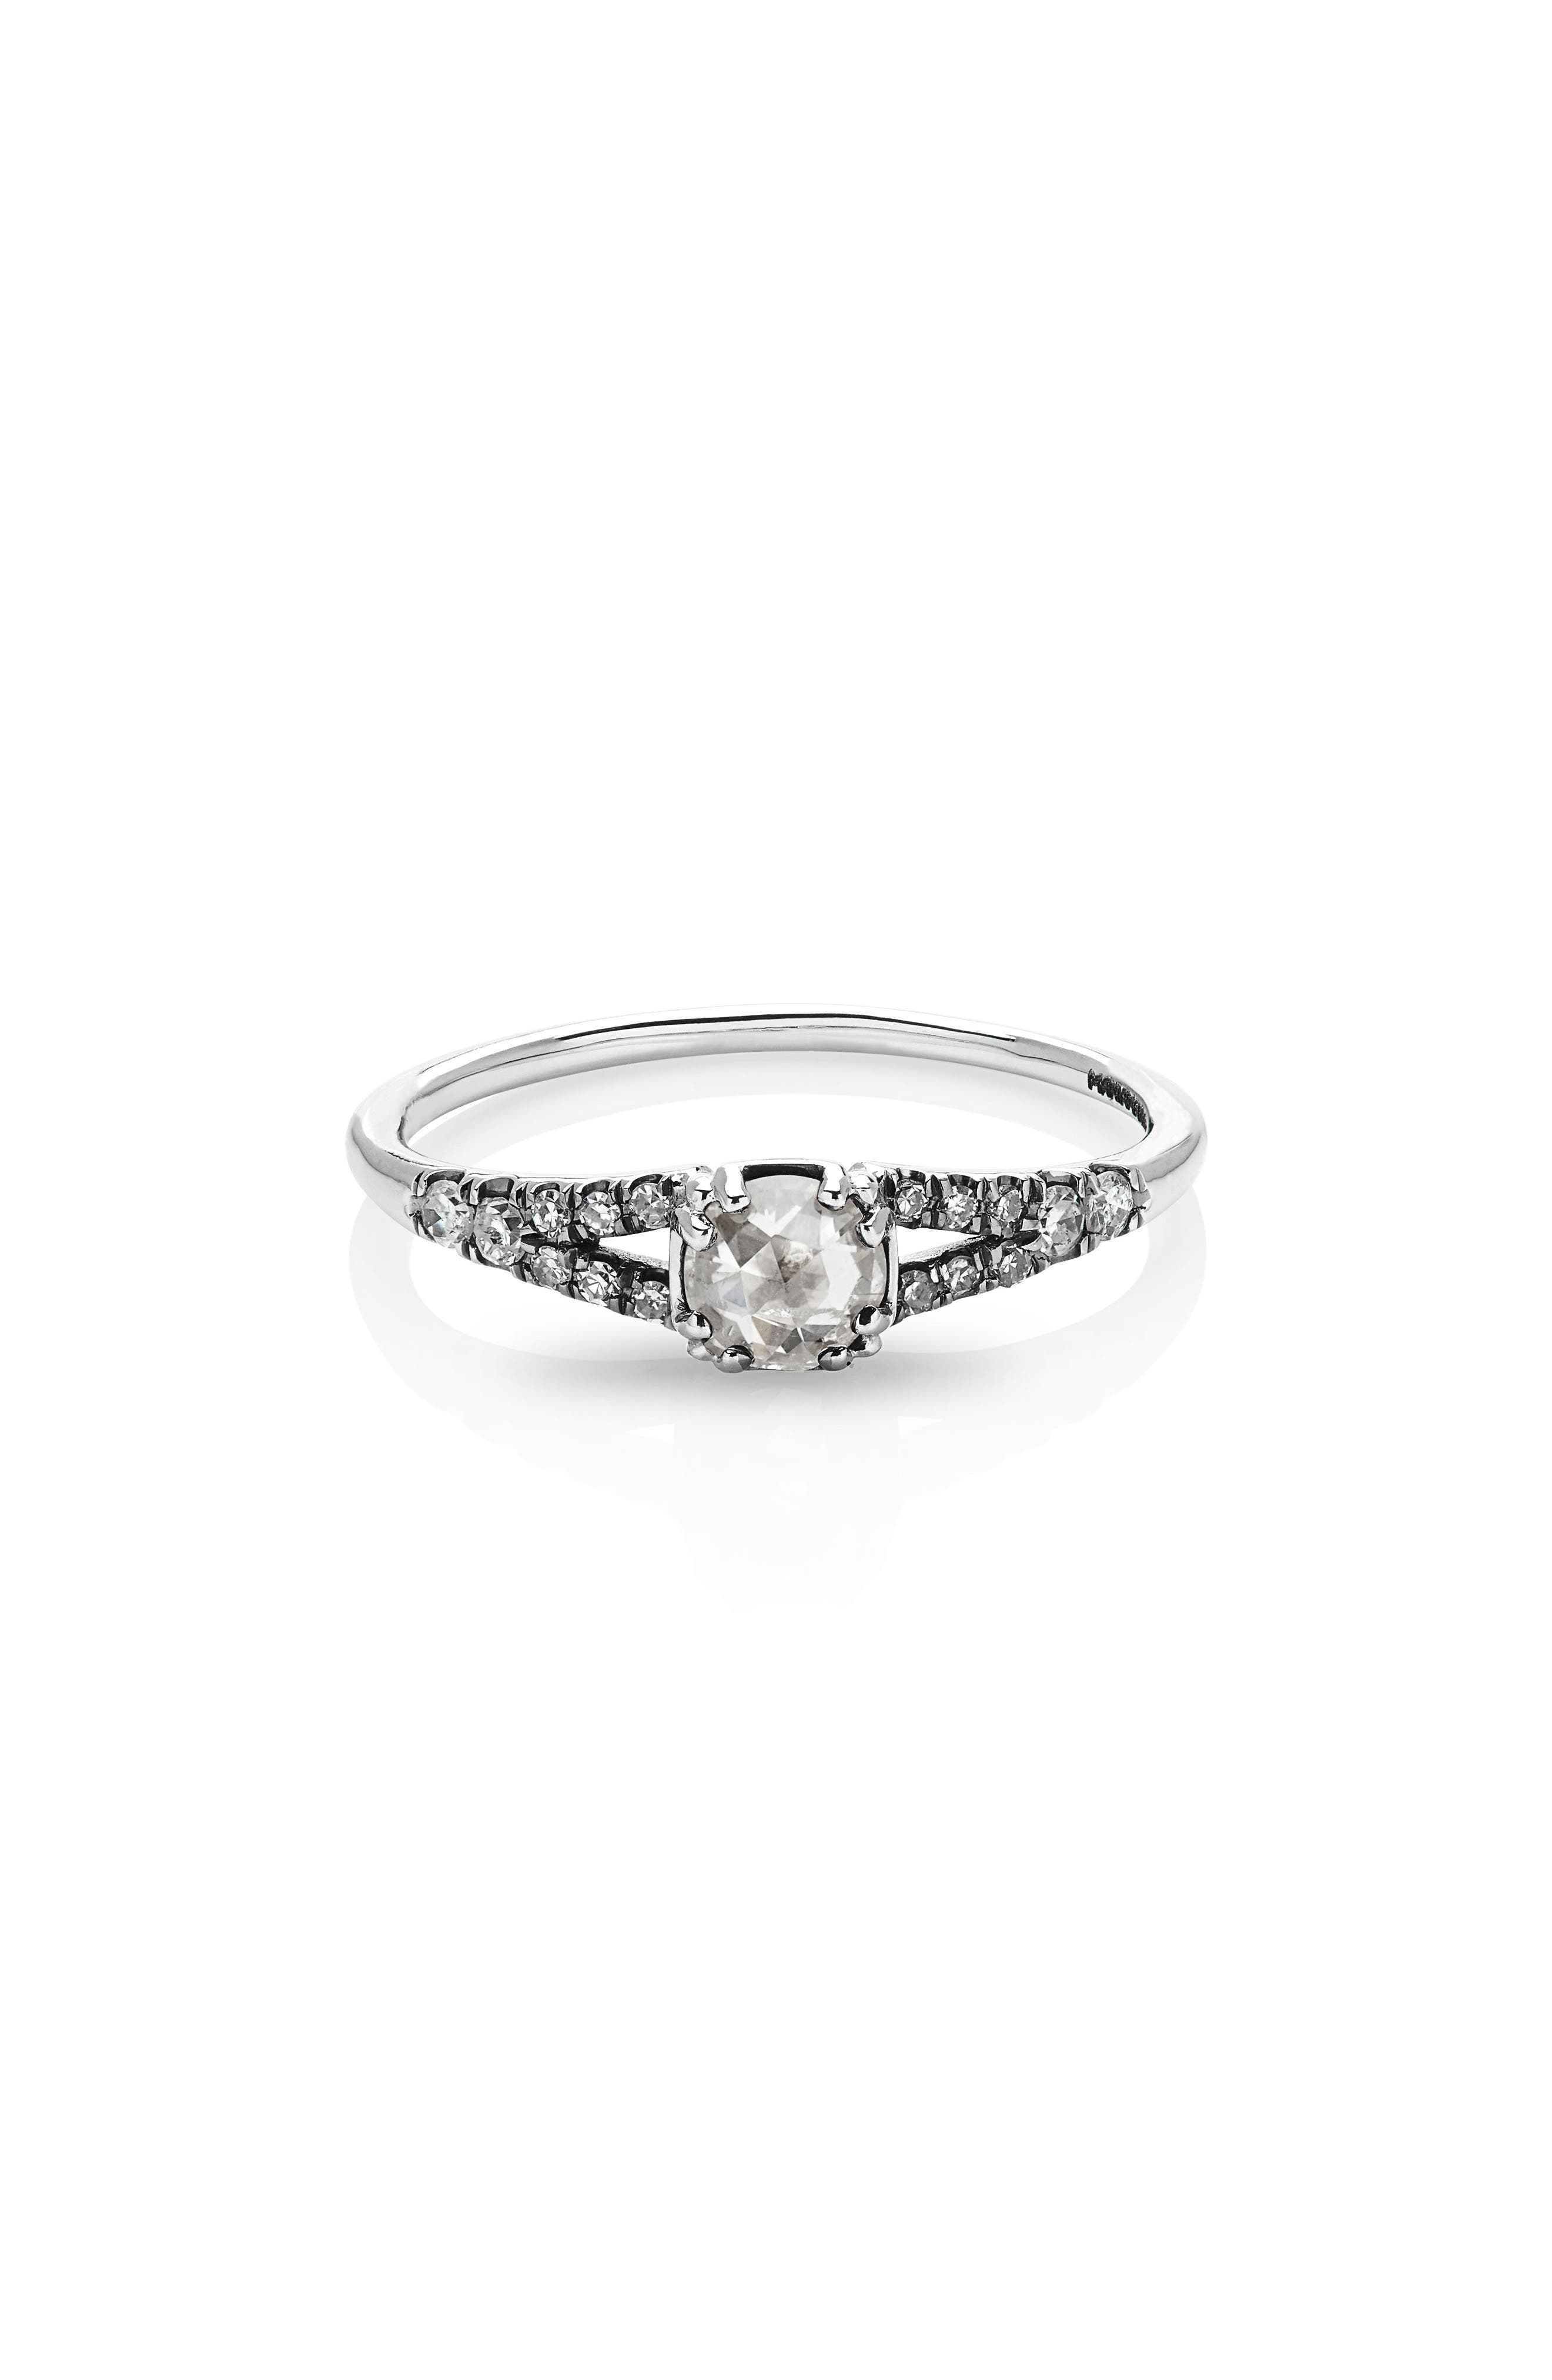 Devotion Solitaire Diamond Ring,                         Main,                         color, White Gold